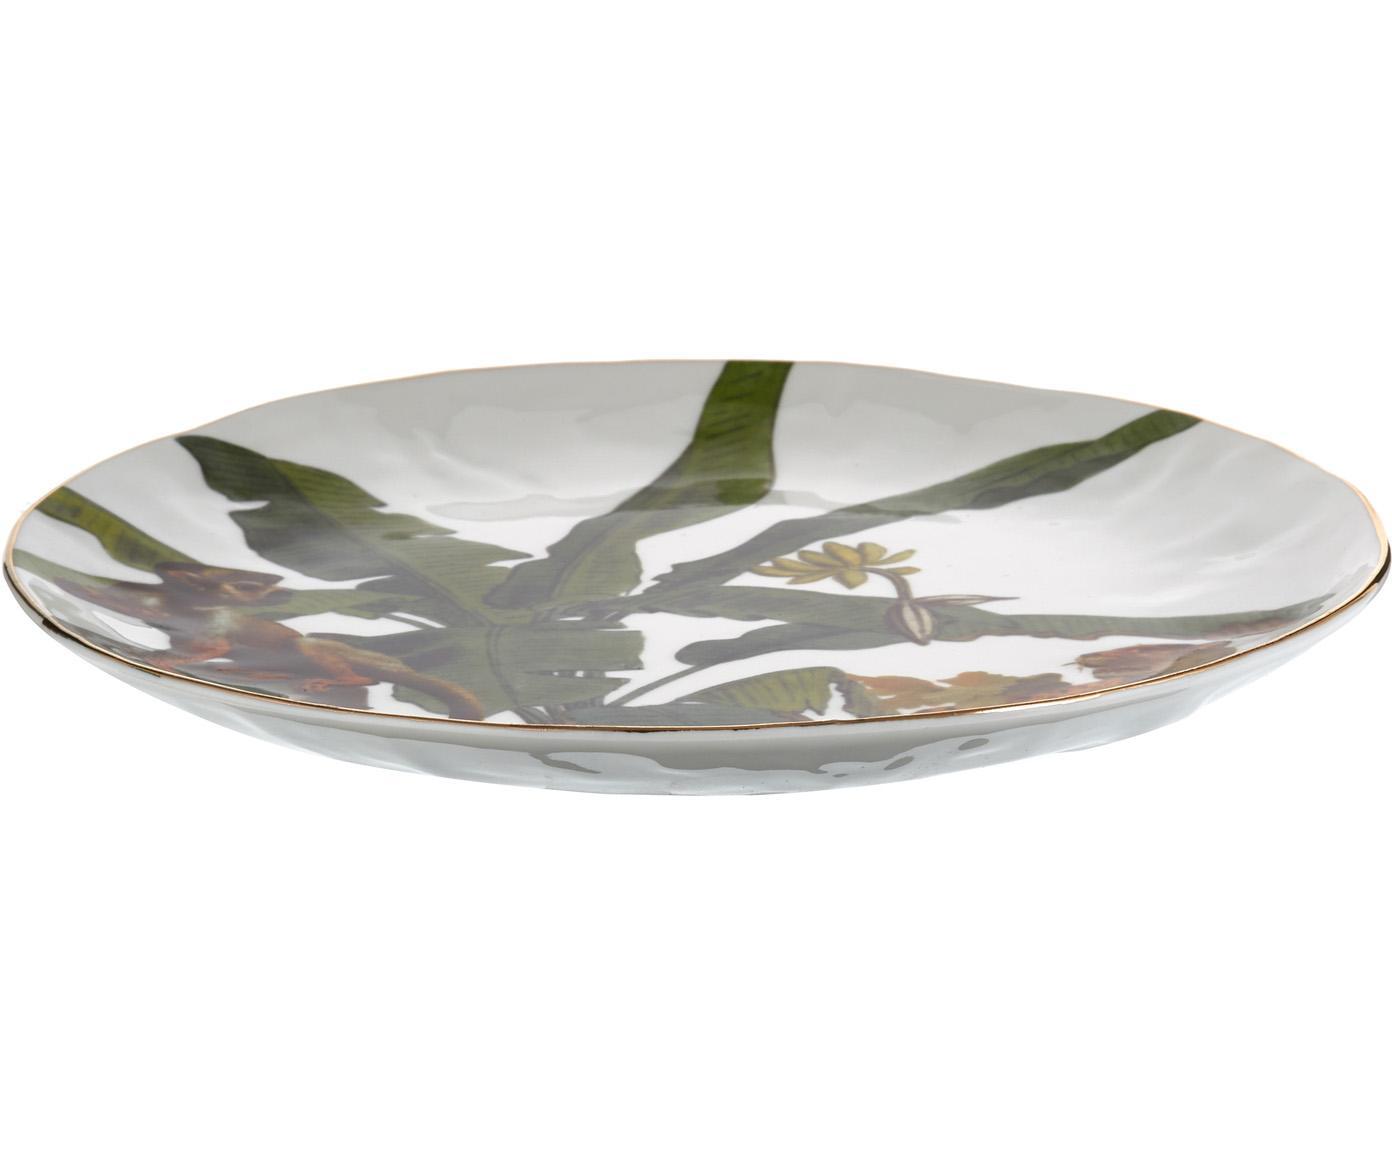 Ontbijtbordenset Animaux, 4-delig, Porselein, Multicolour, Ø 20 cm